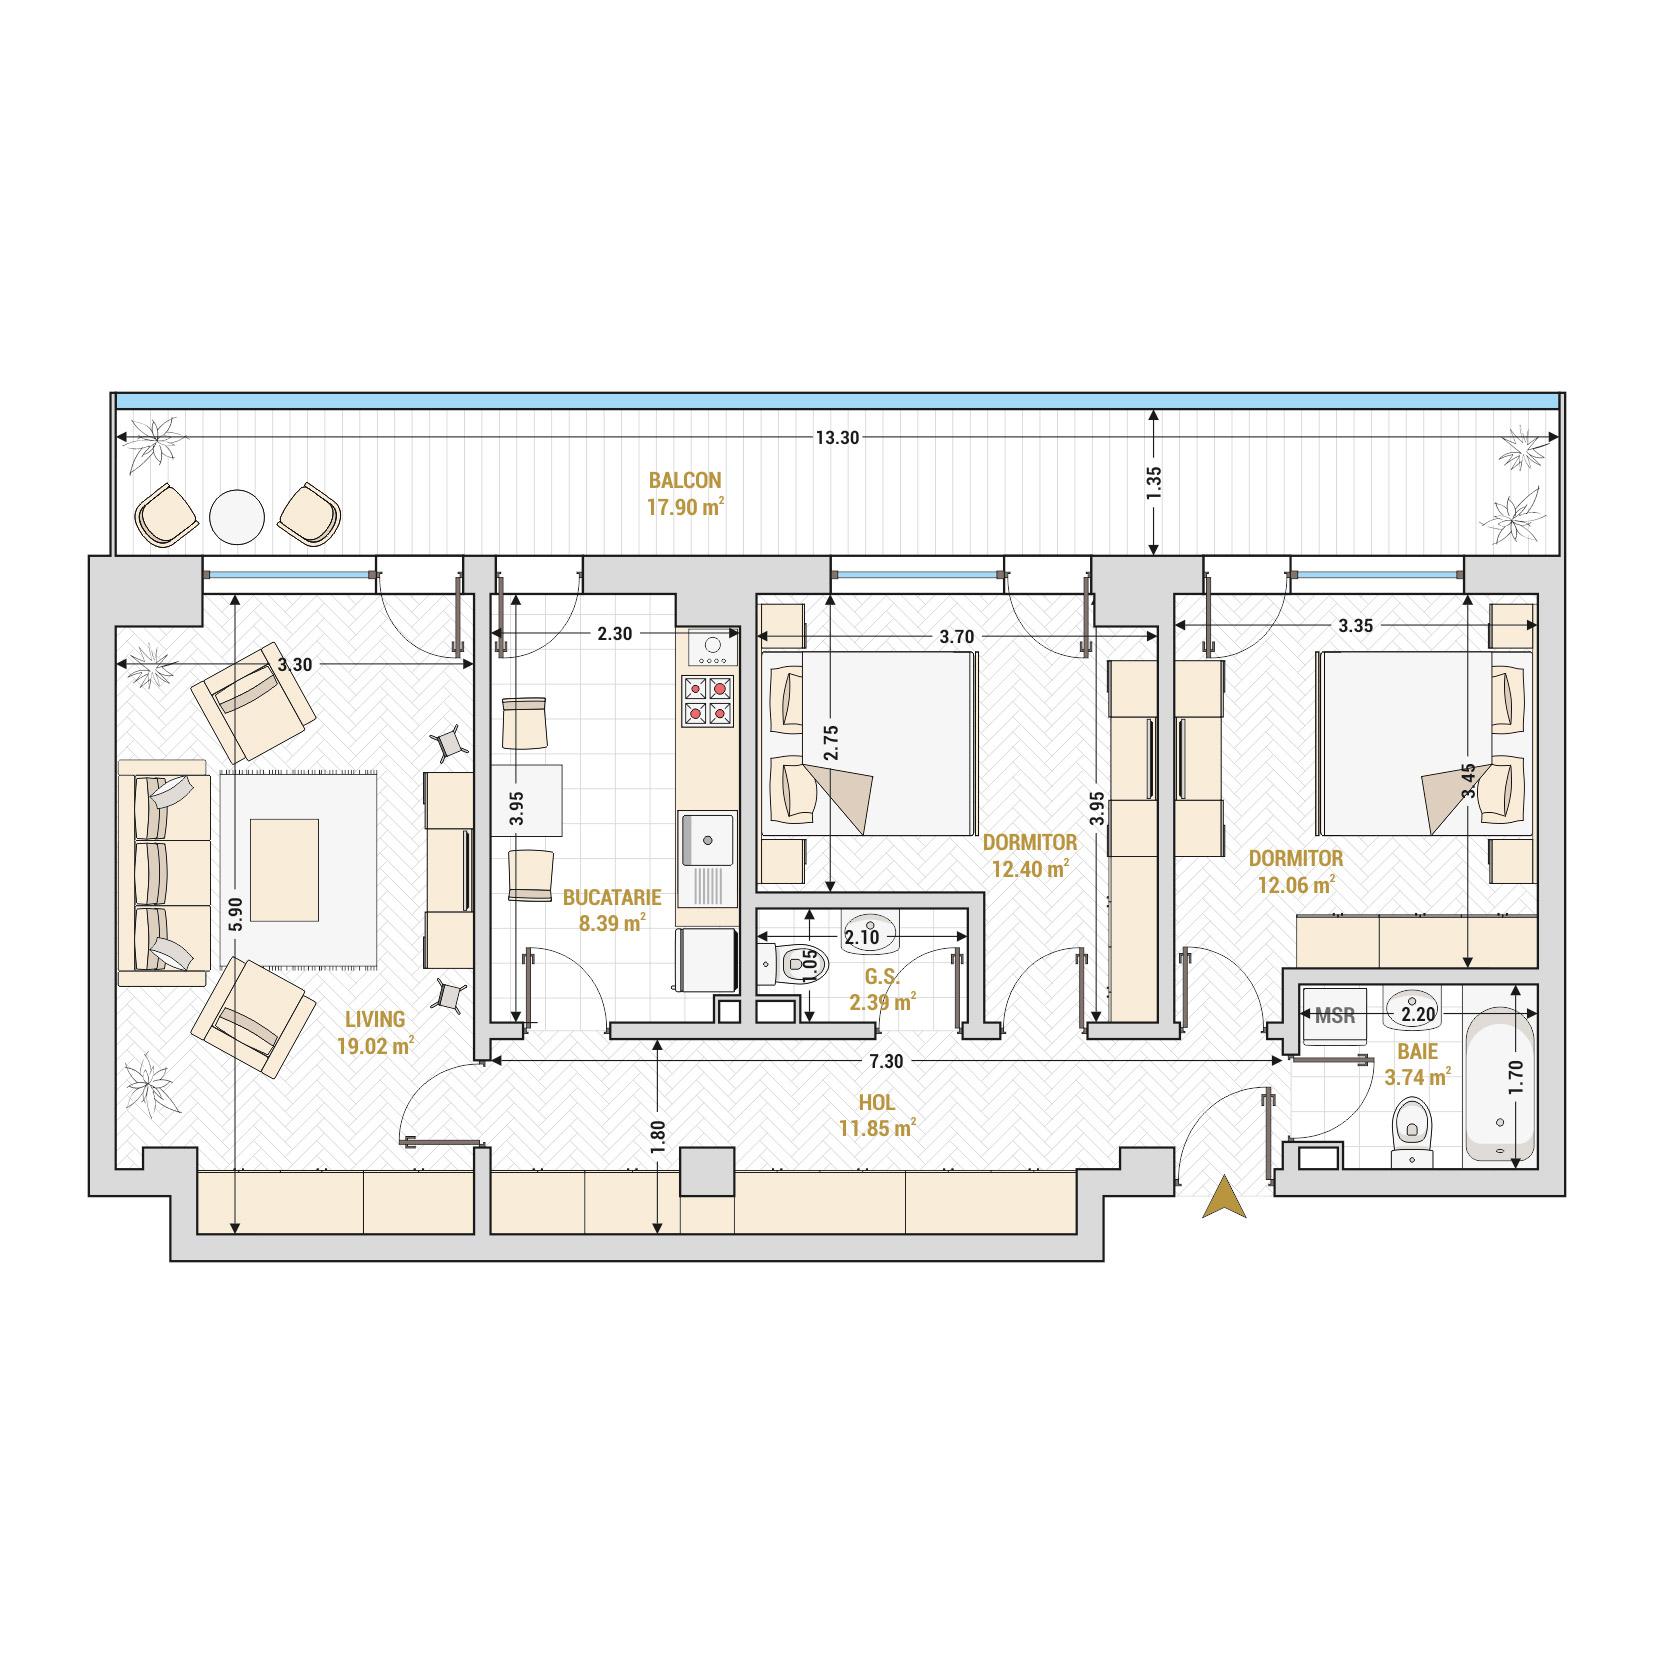 Apartament 3 camere de vanzare Bucuresti - Catedral Residence - Marriott, Piata Unirii, 13 Septembrie, Izvor - Tip 5 - T2A